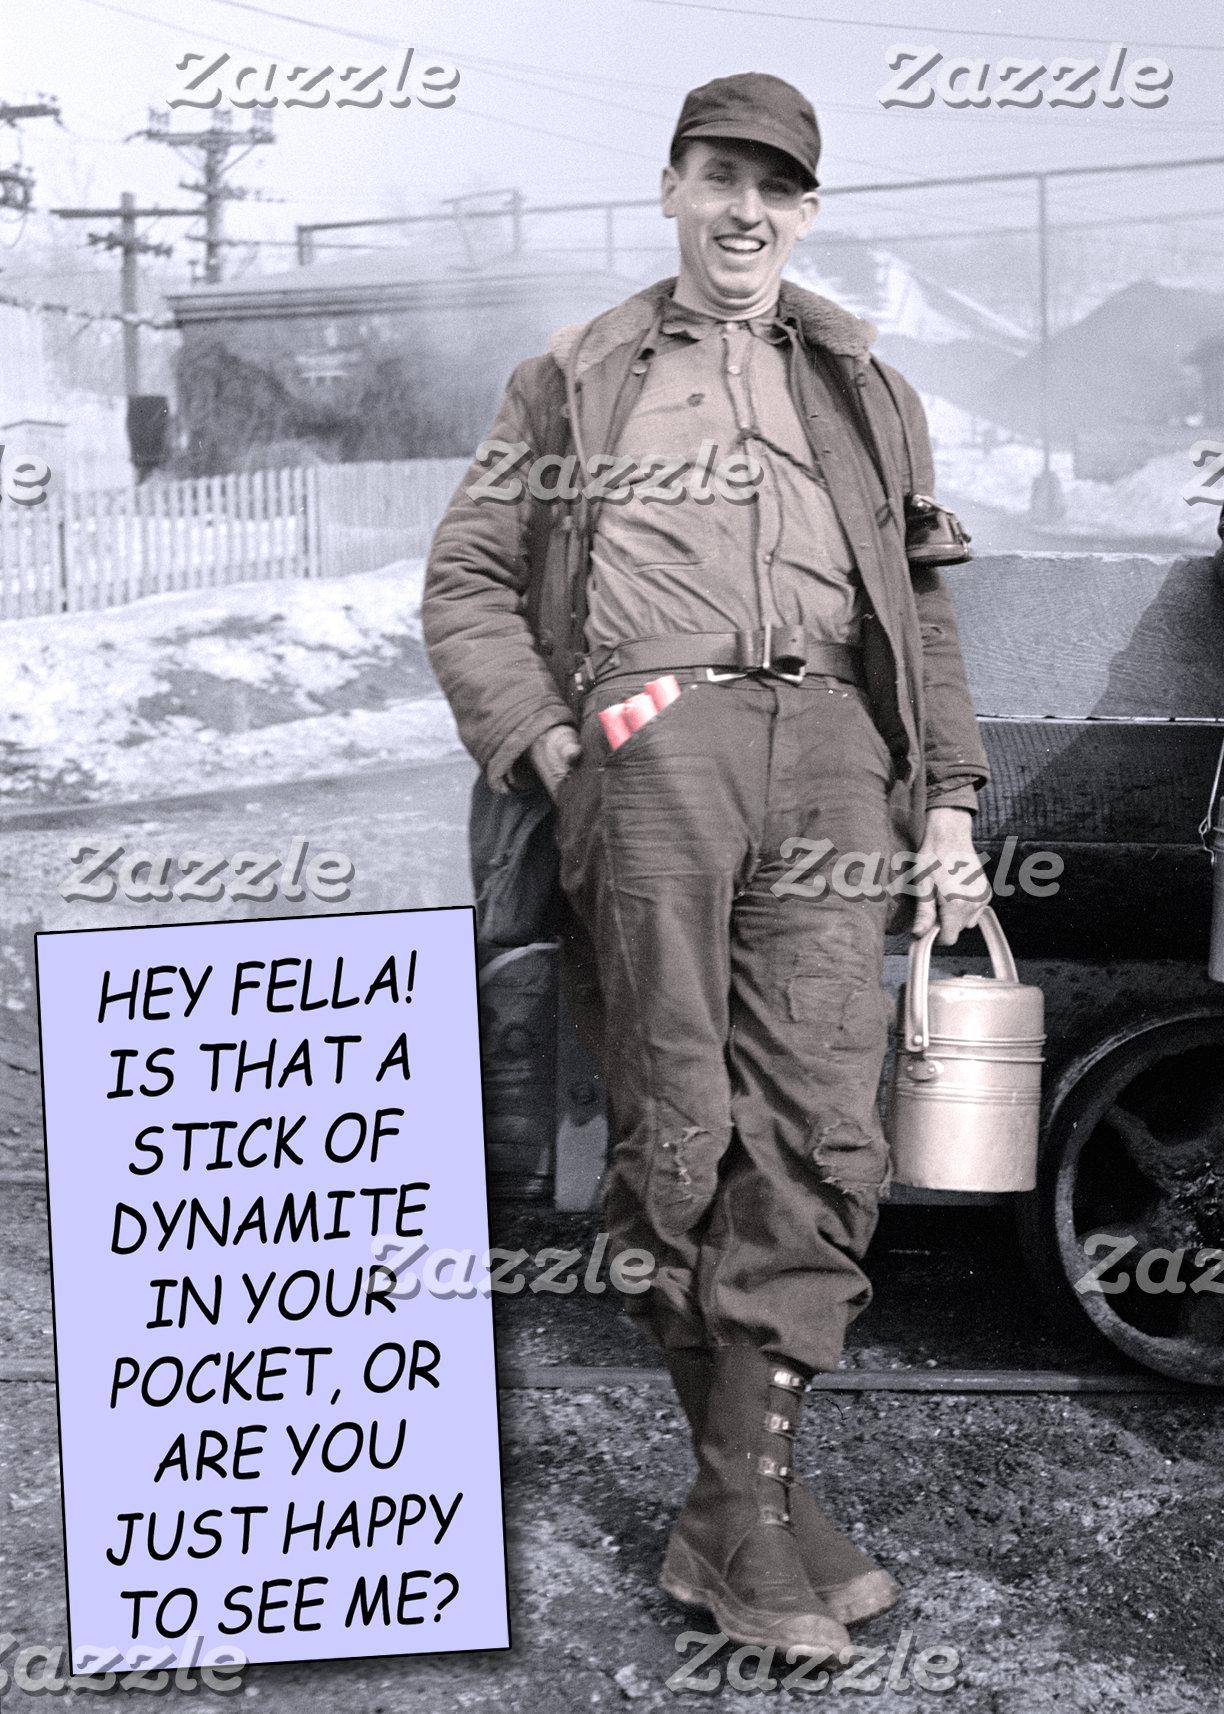 Dynamite?